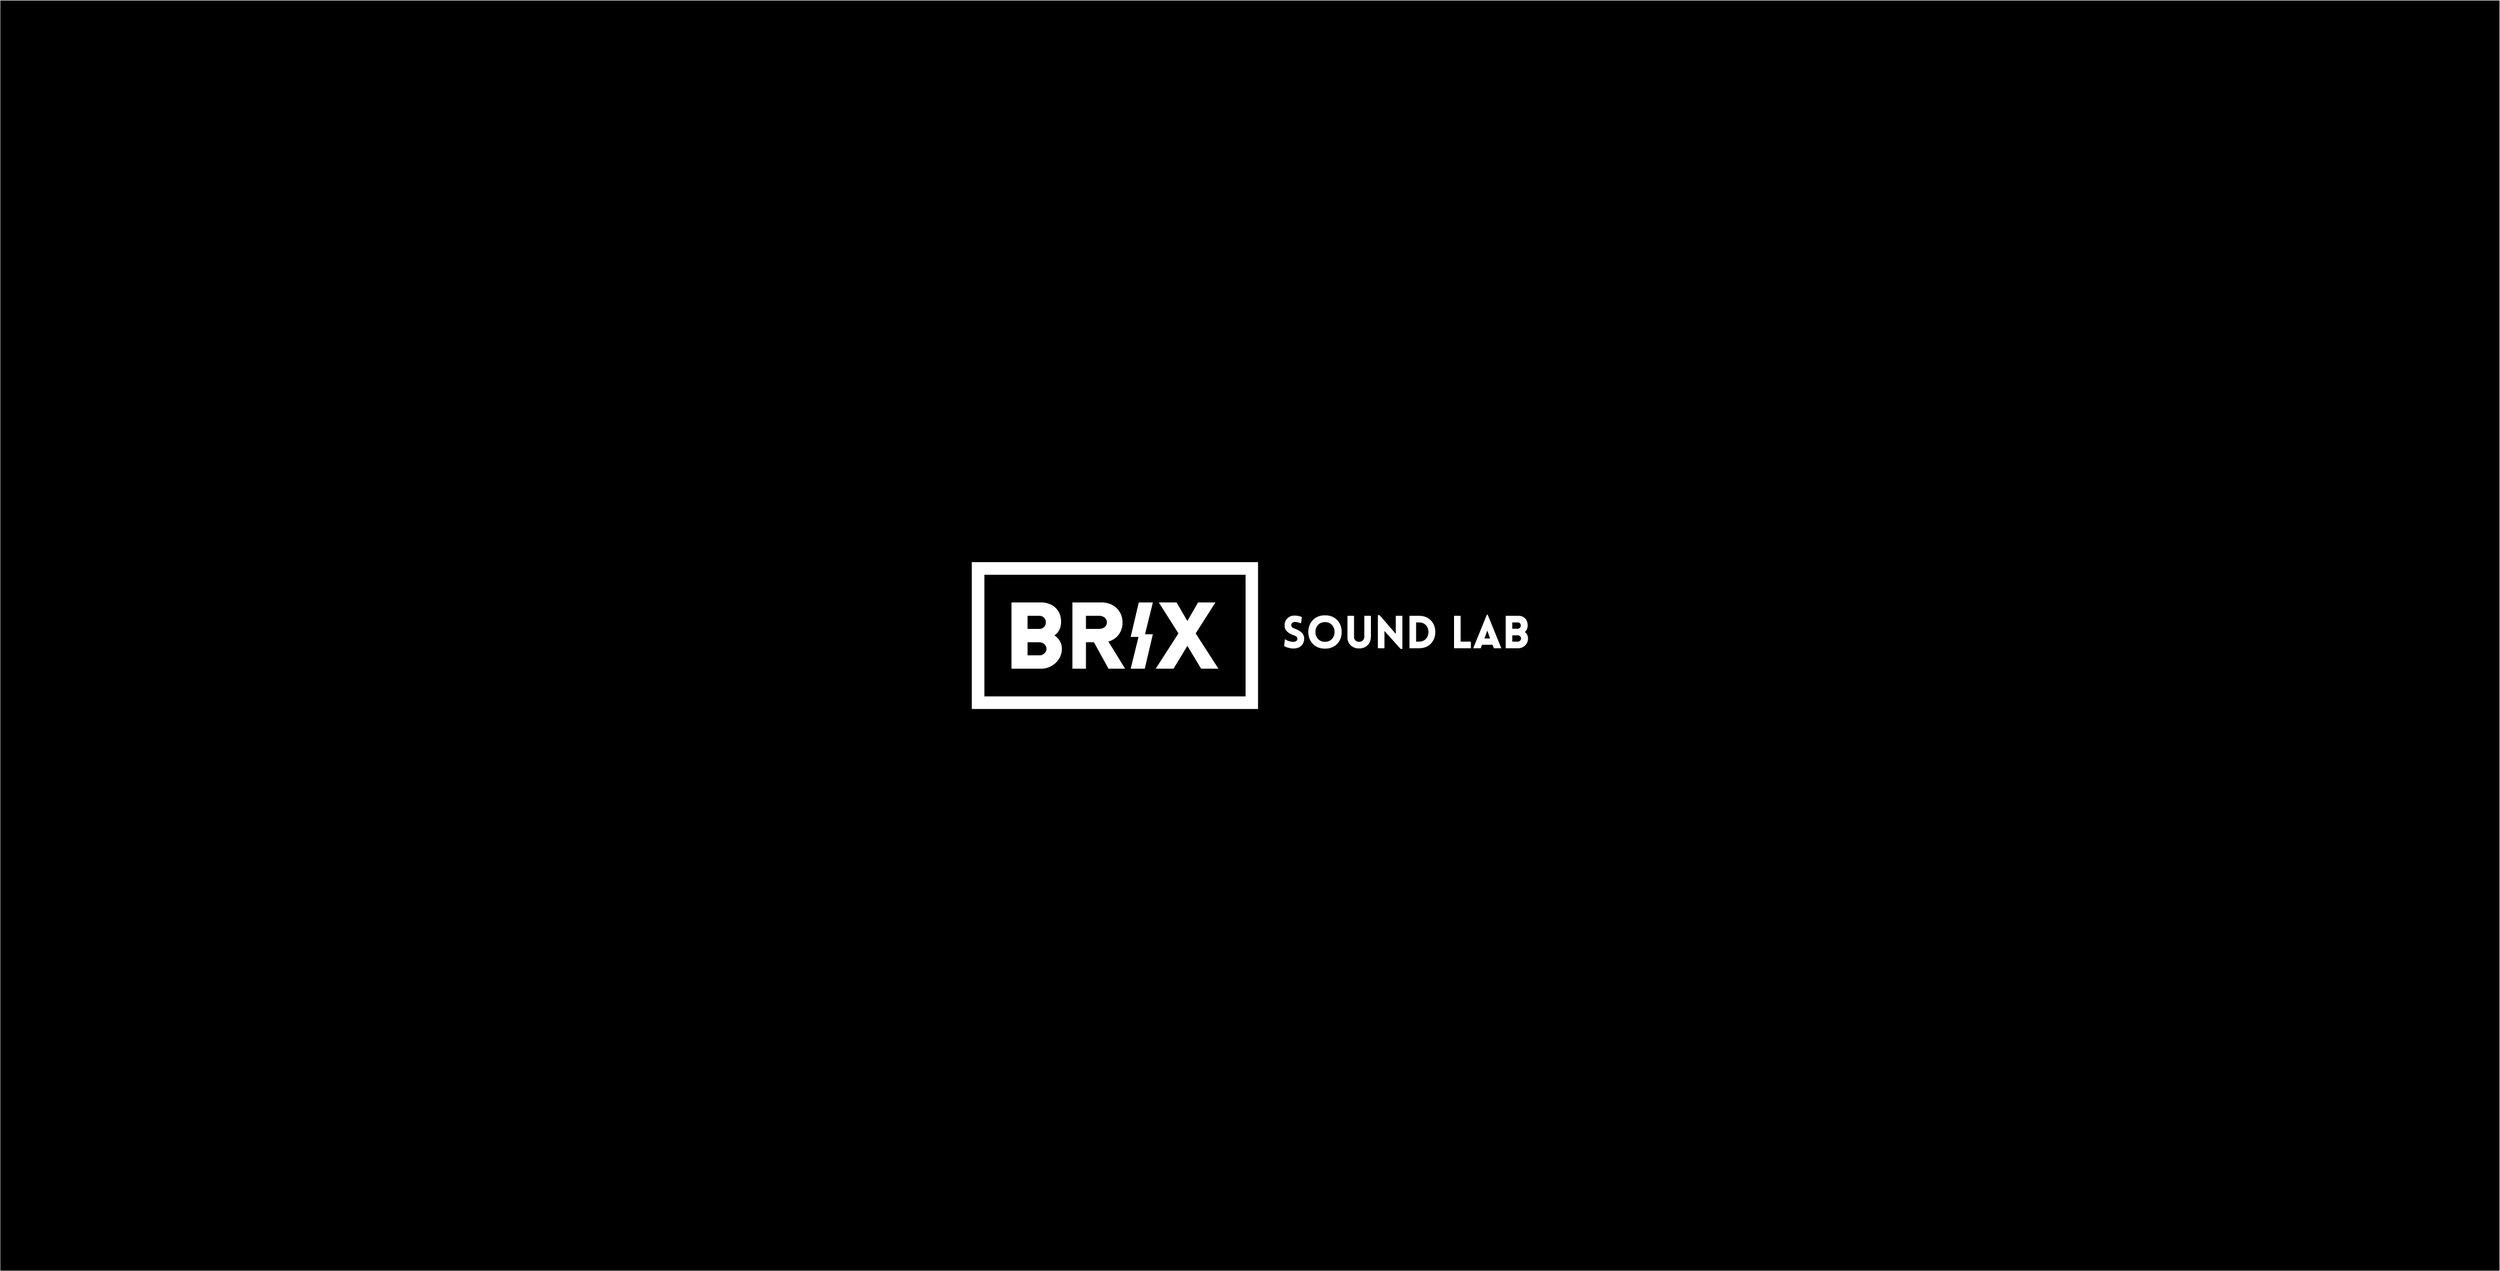 Brix Sound Lab-03-03-03.jpg